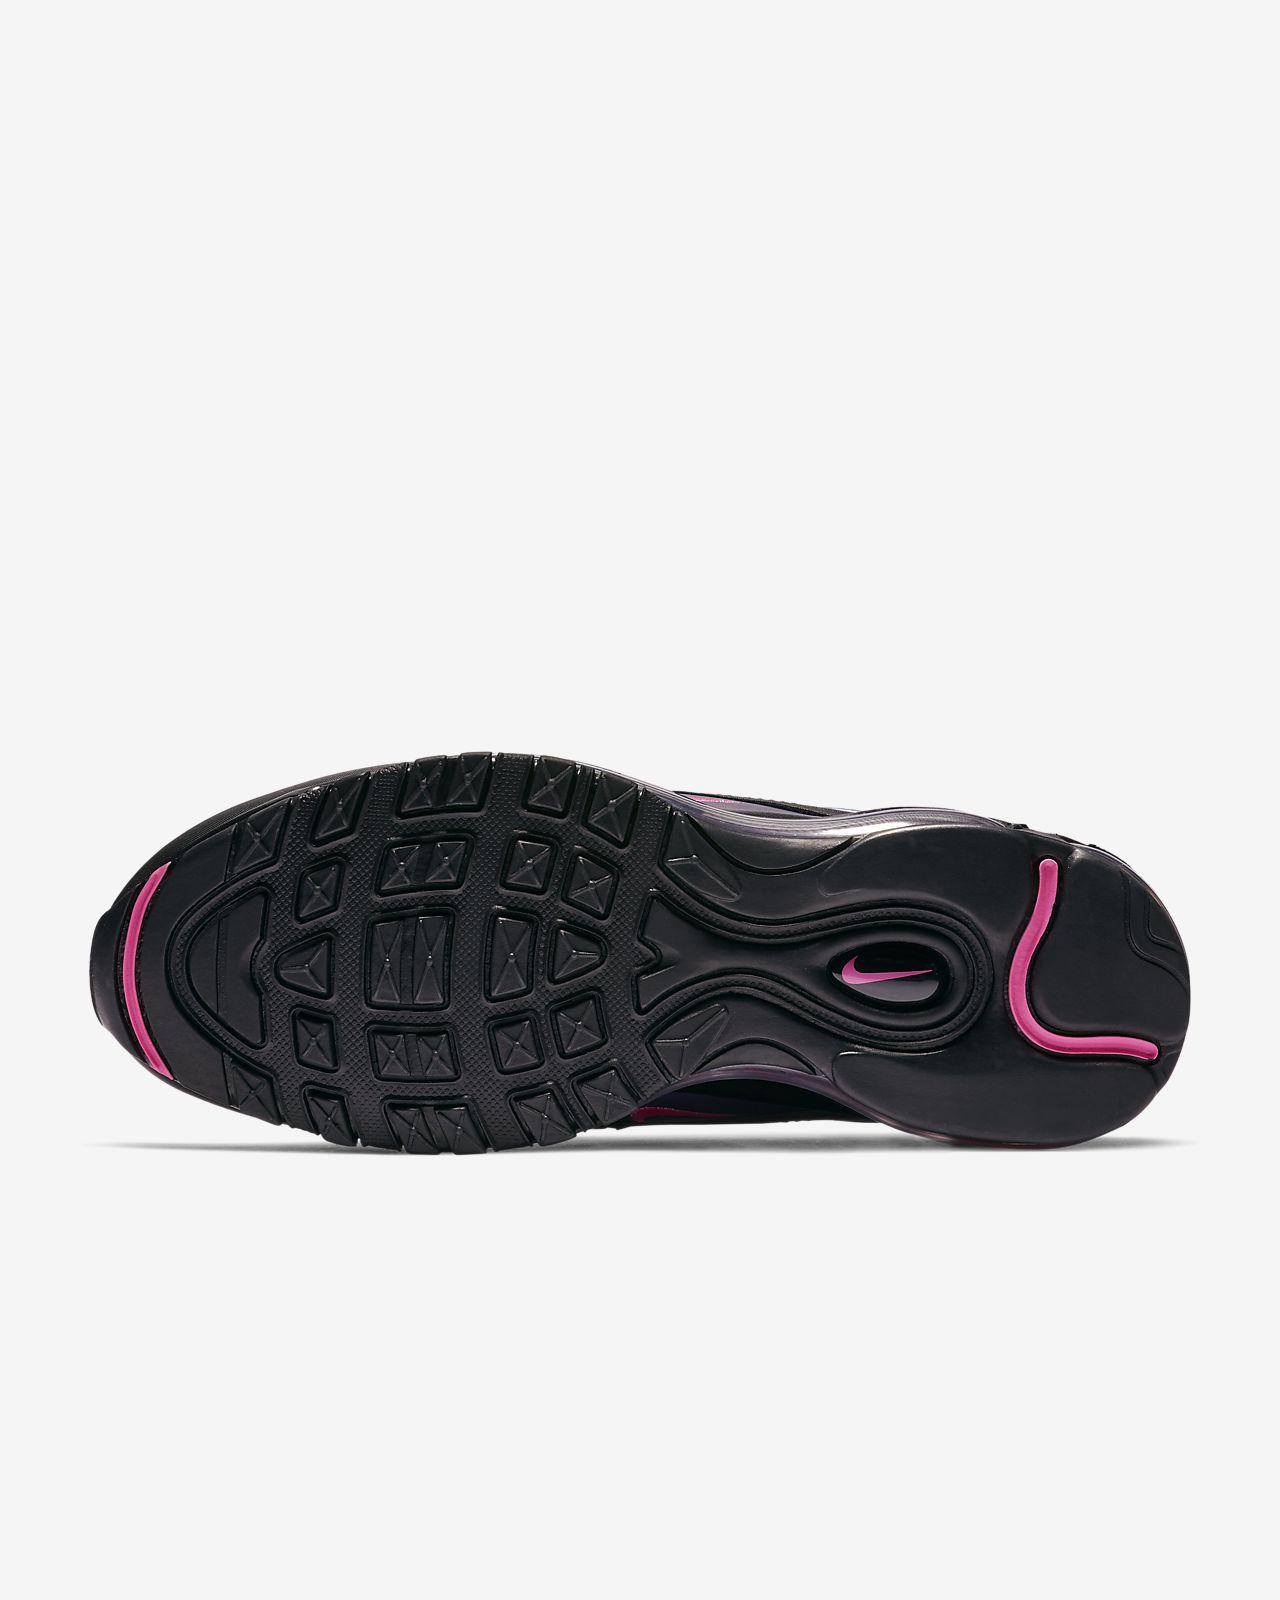 e7d0752f4c18 Nike Air Max 97 RF Women s Shoe. Nike.com IE